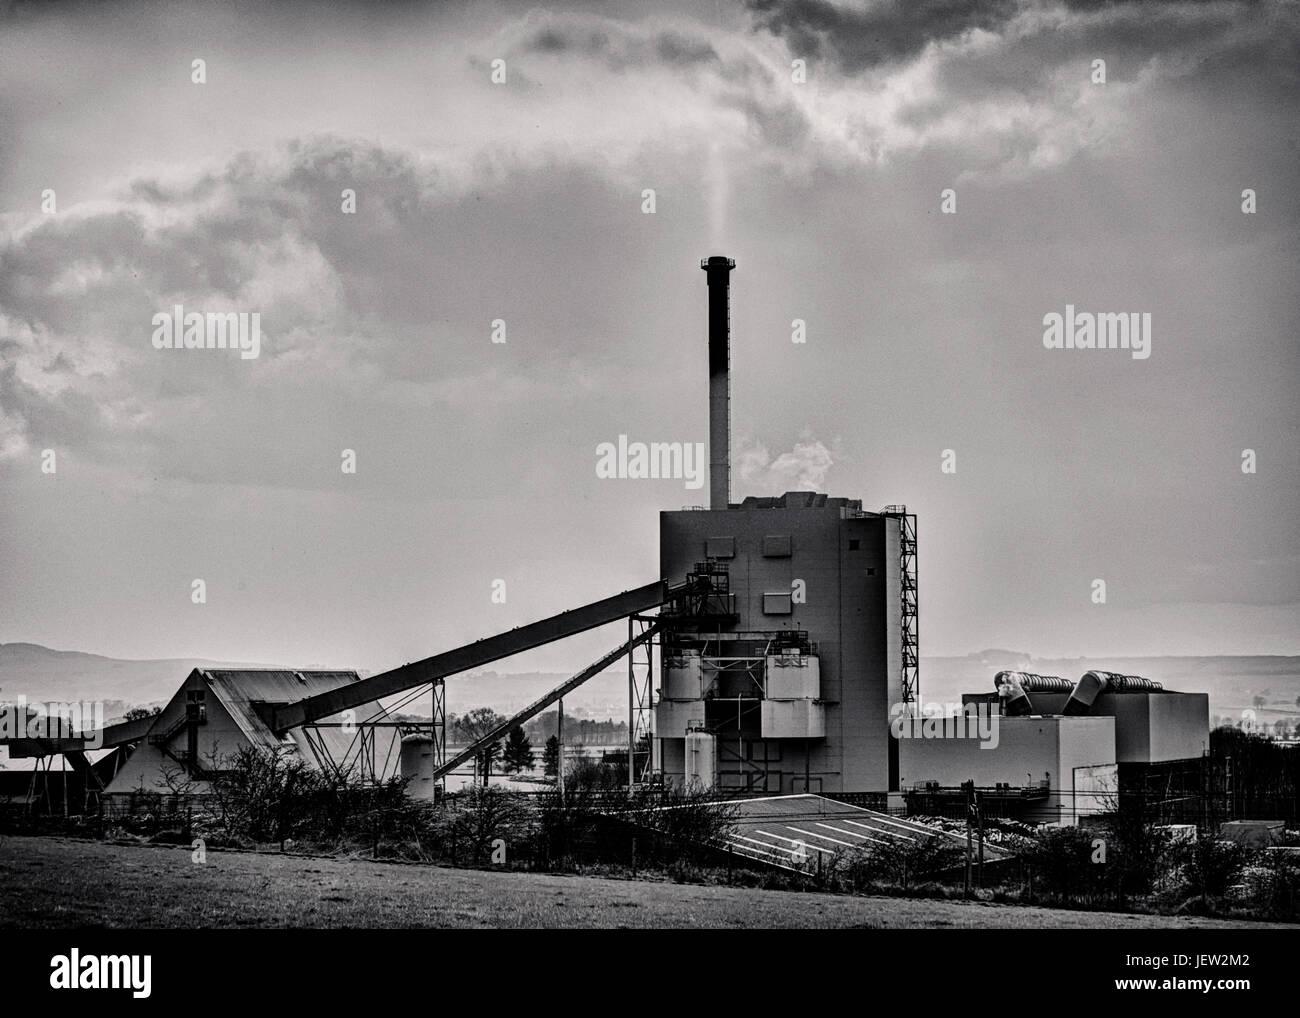 Steven's Croft biomass power station - Stock Image